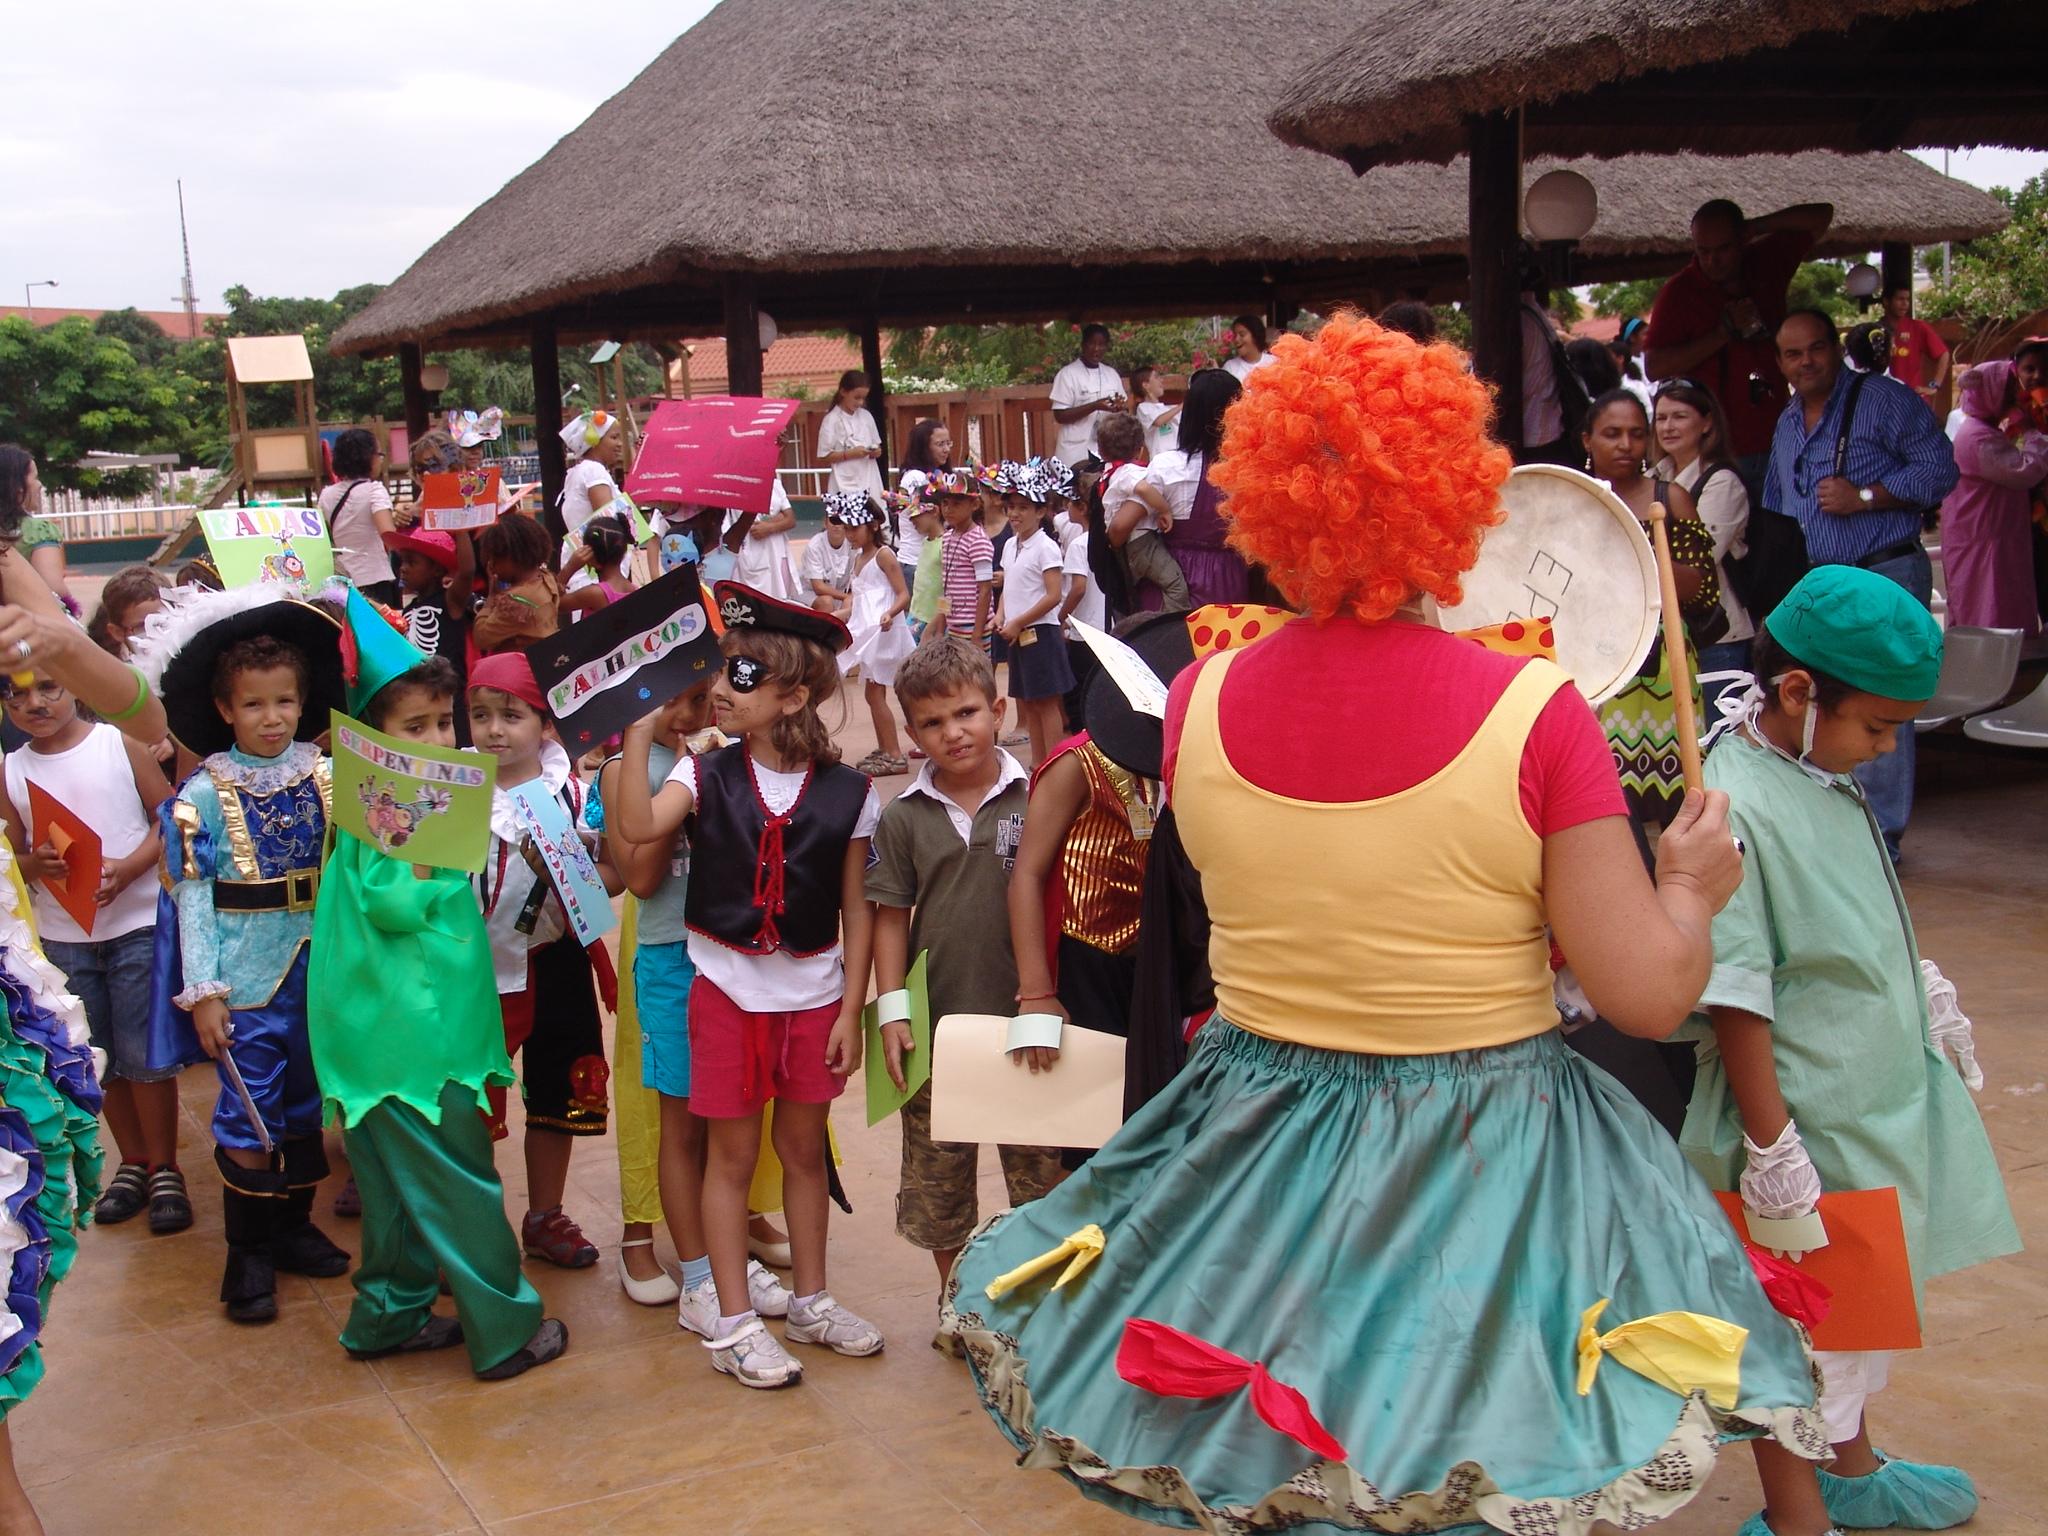 Carnaval 2008-2009